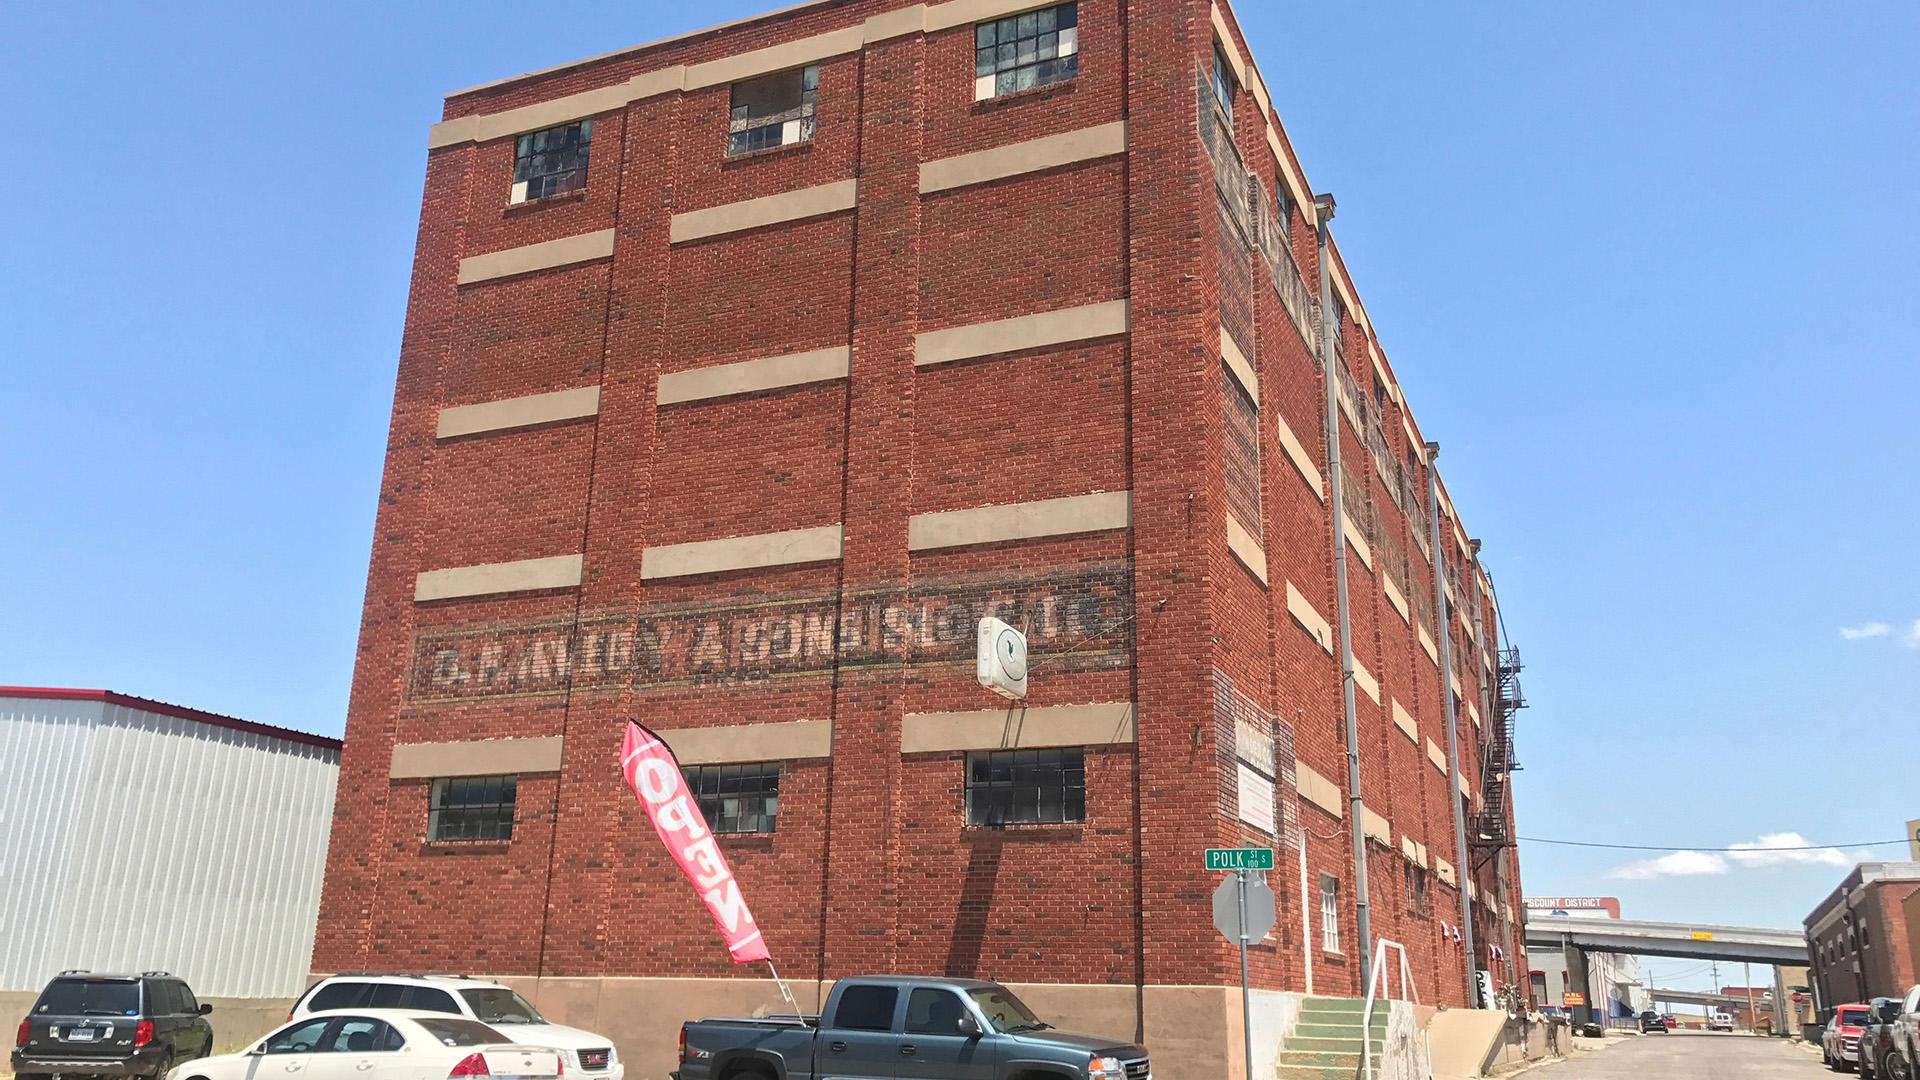 Historical warehouse active again